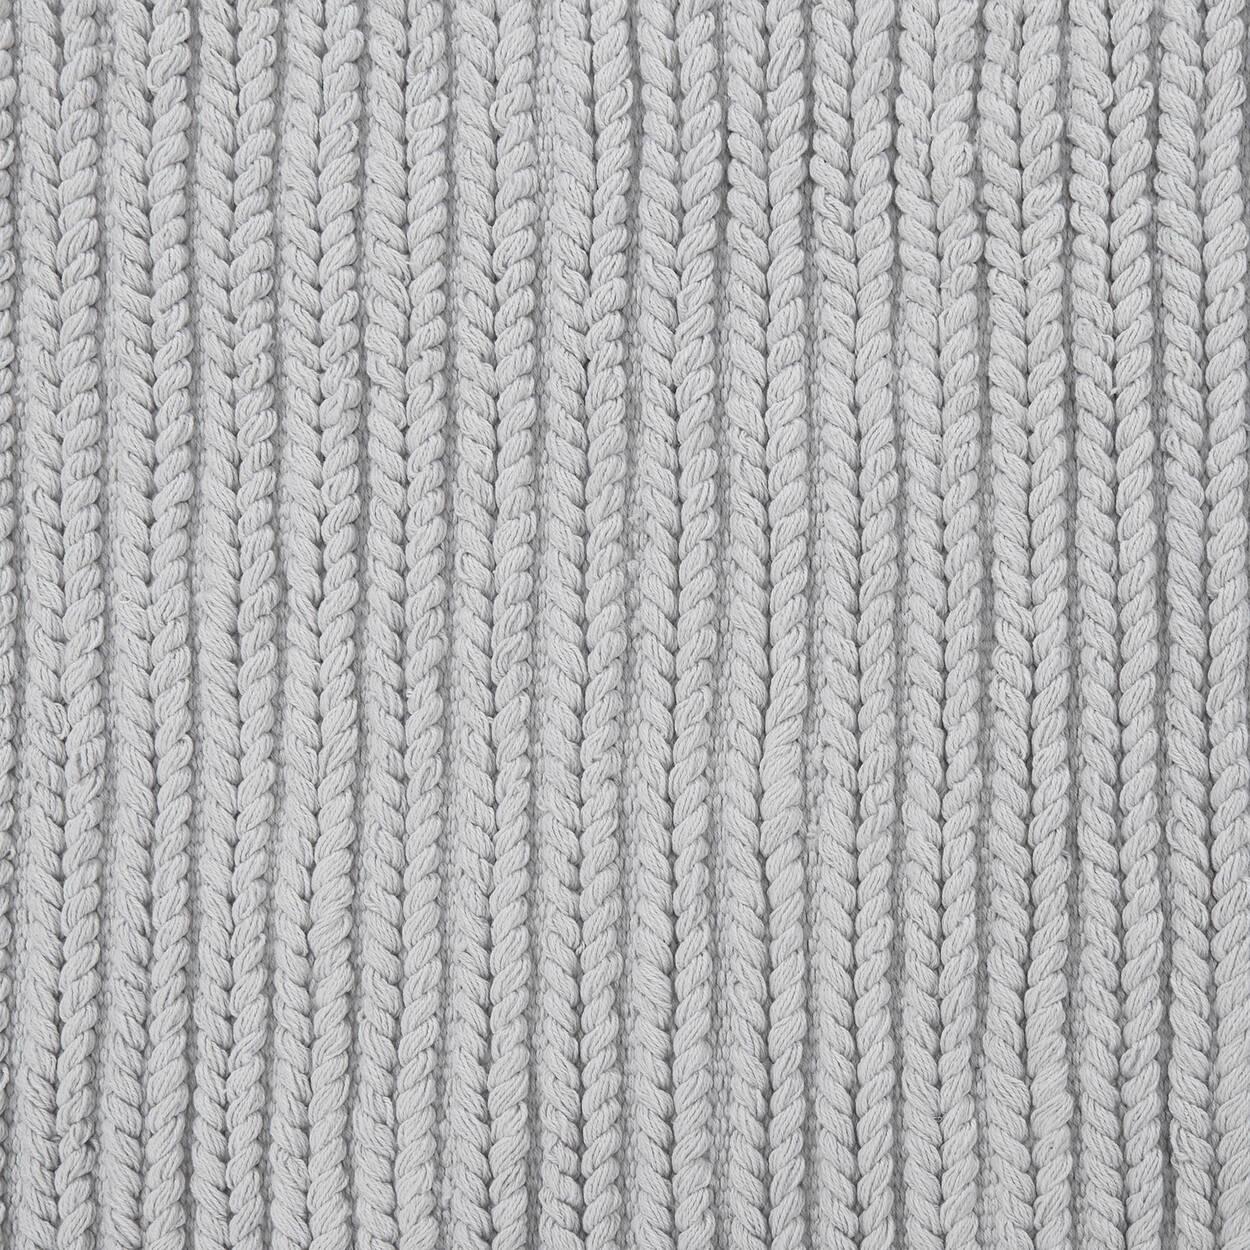 Braided Cotton Rug